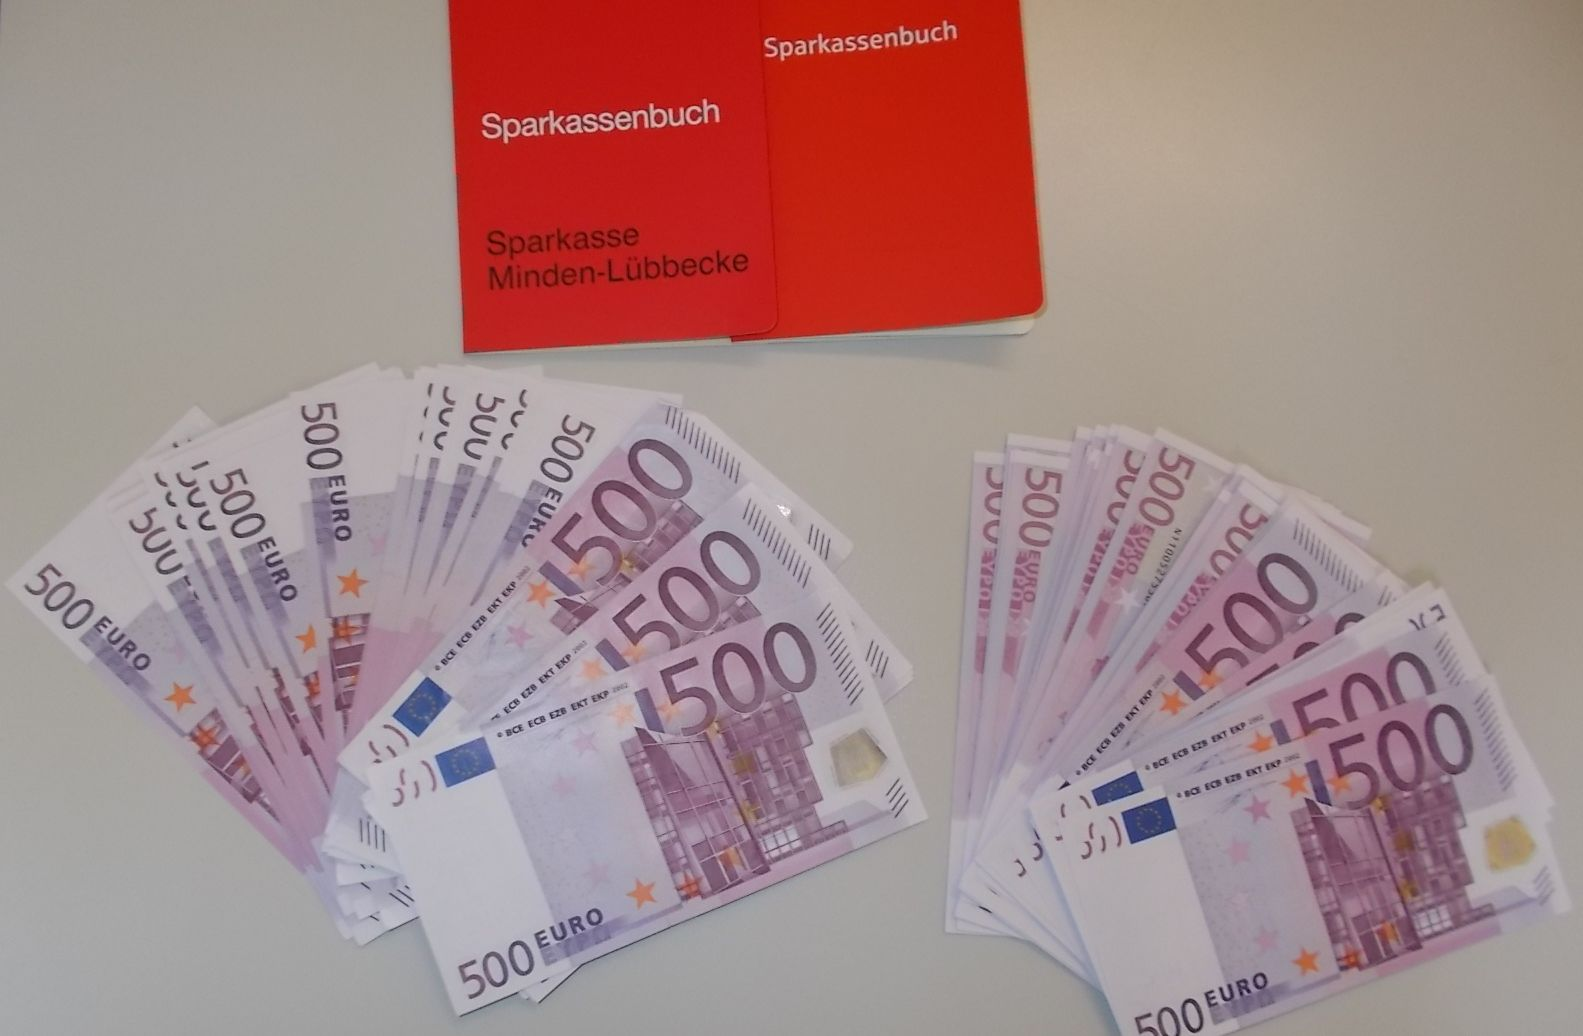 Syrian Refugee finds money